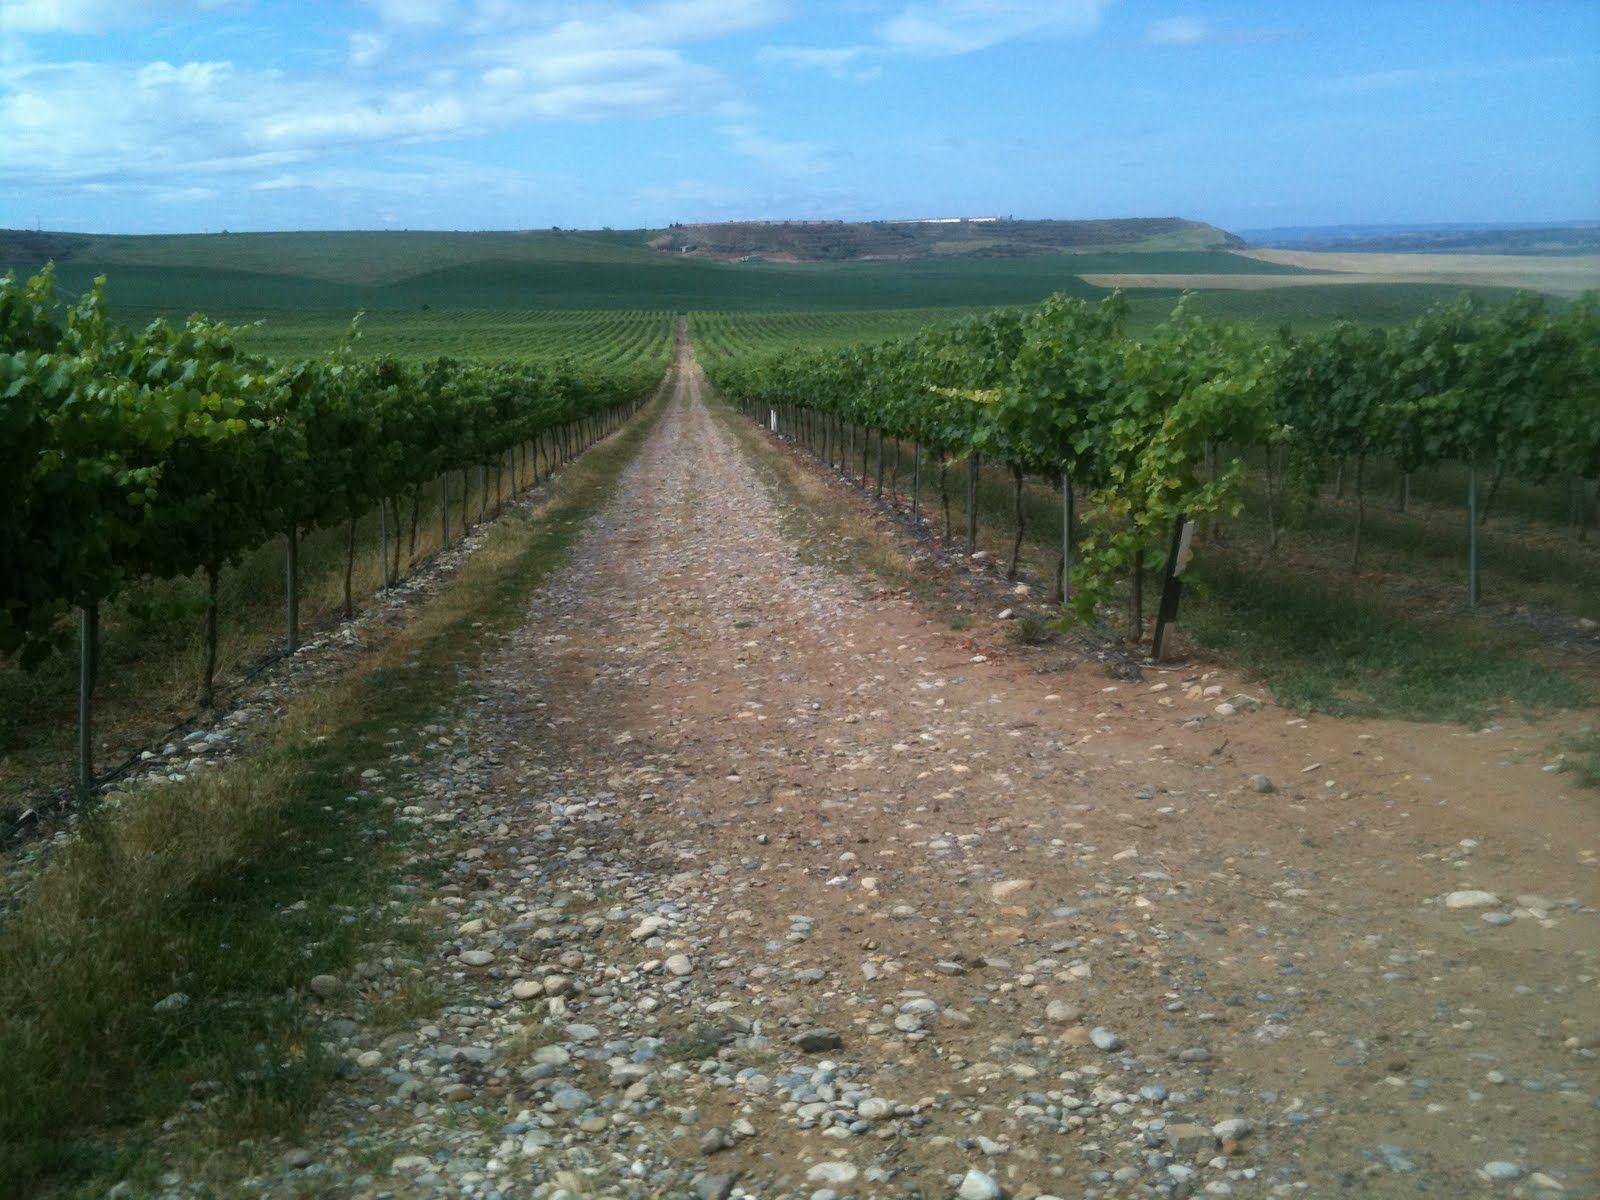 Codorniu cava vineyard near Barcelona. Spent the day there last fall.